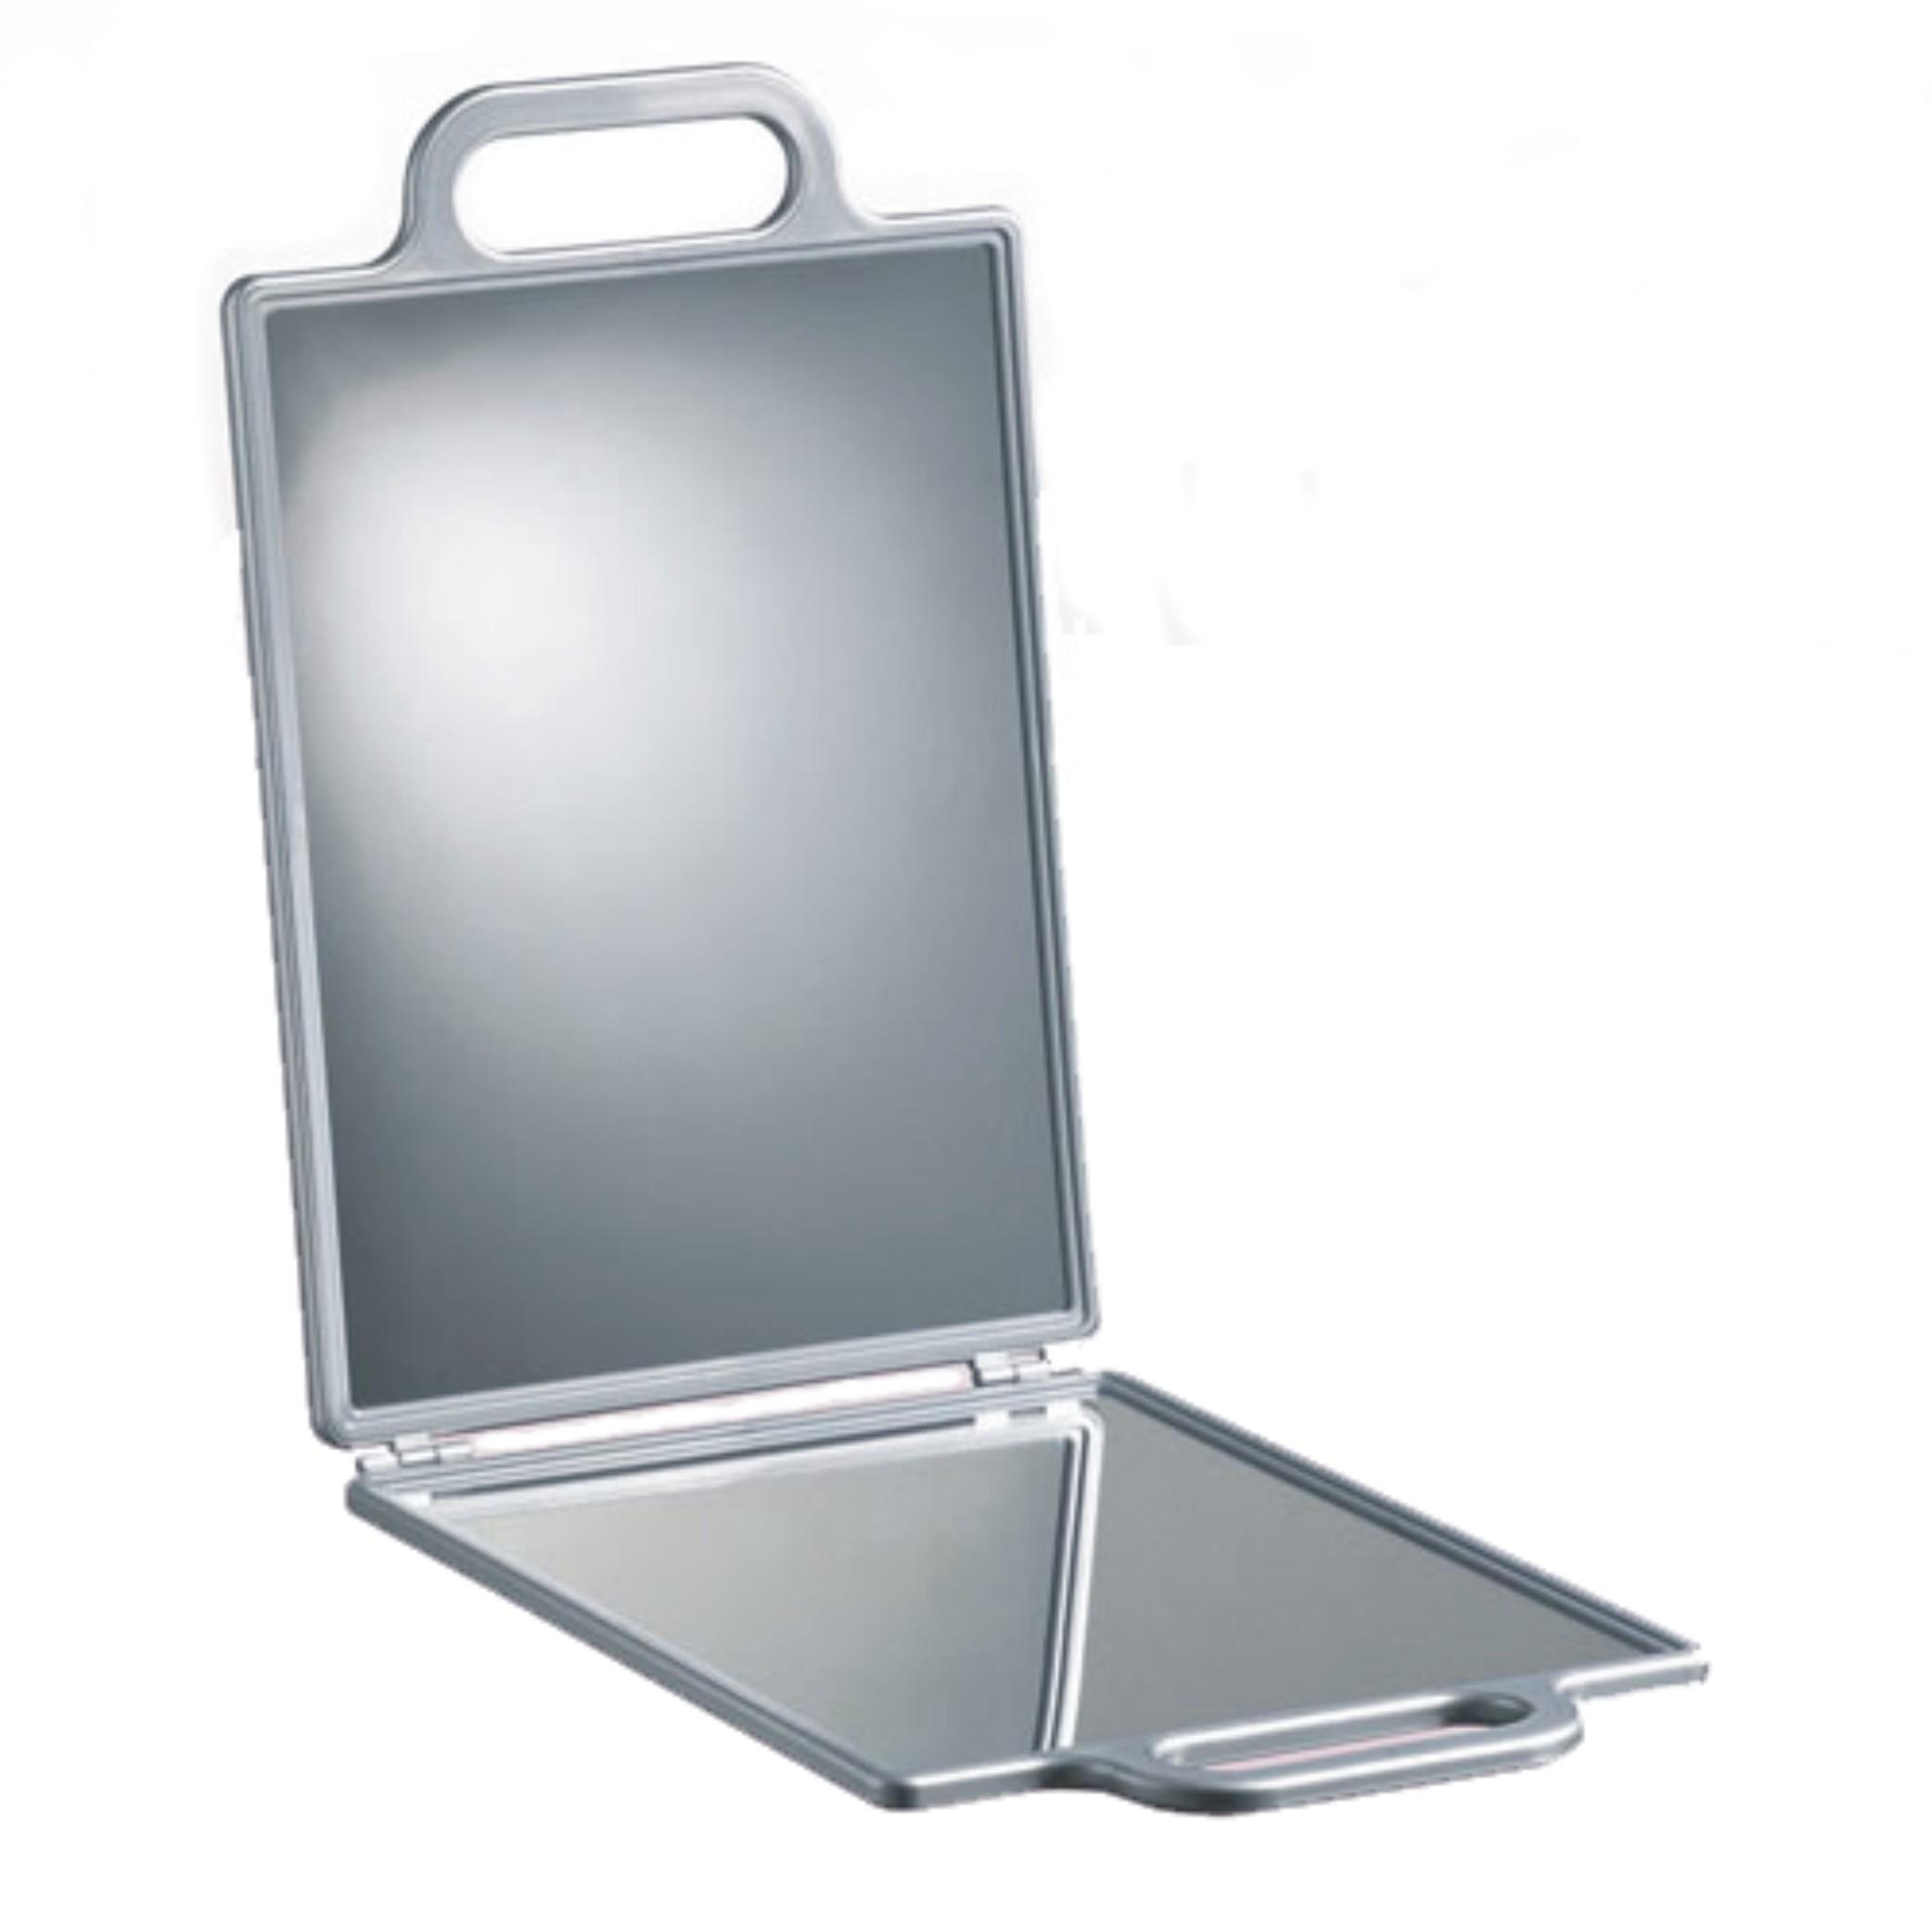 Kabinett-Spiegel doppelt